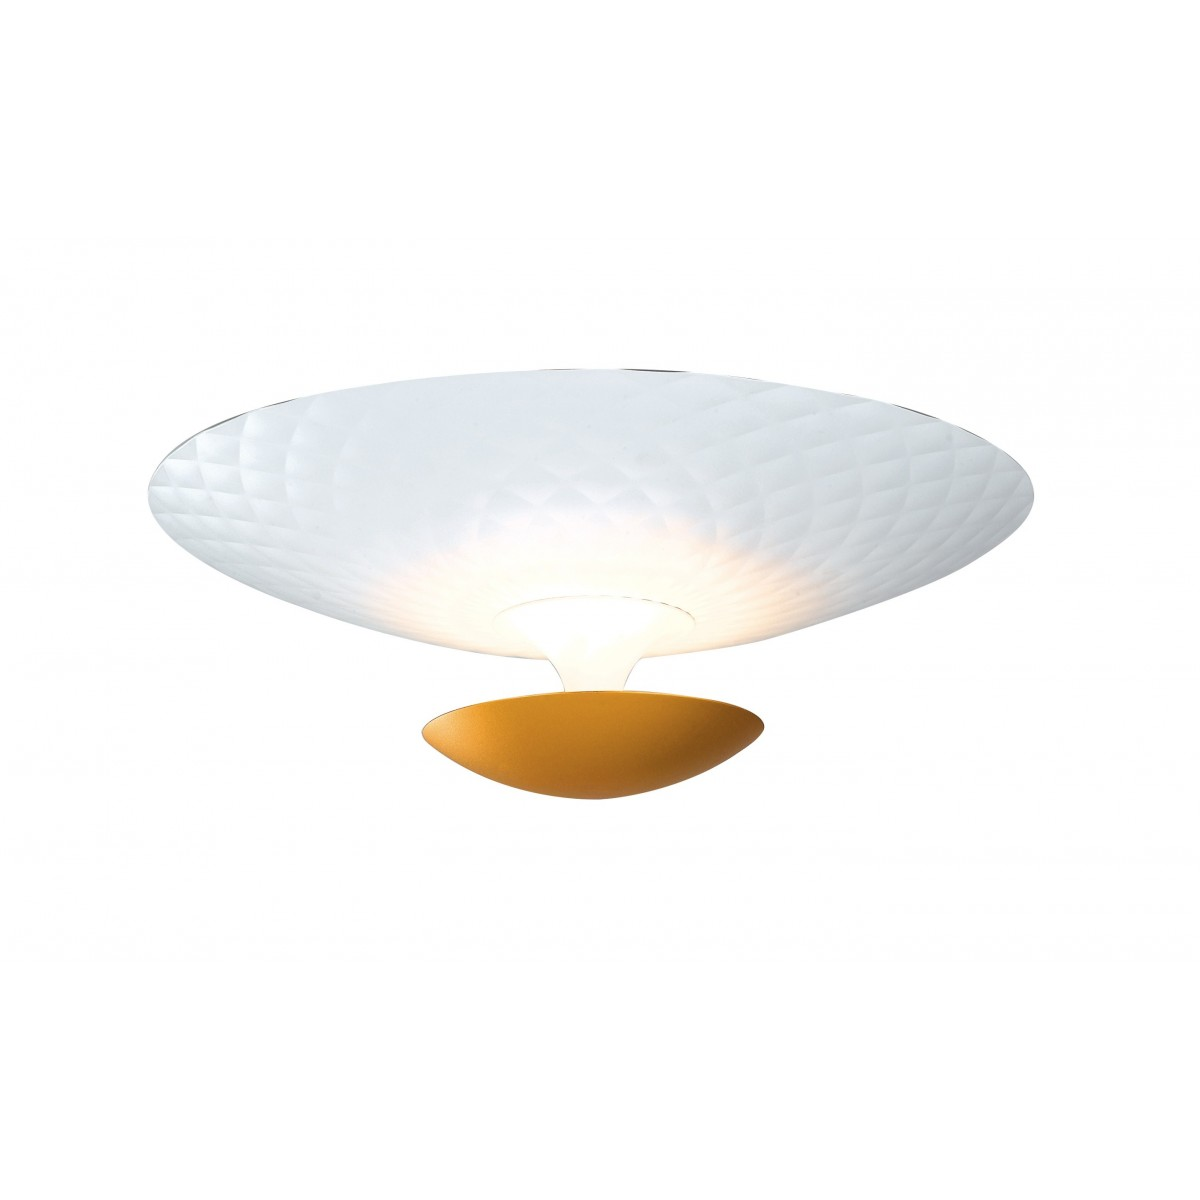 LED-HAMLET-PL55 - Plafoniera Cicolare Alluminio Bianco Oro Moderna Led 40 watt Luce Calda